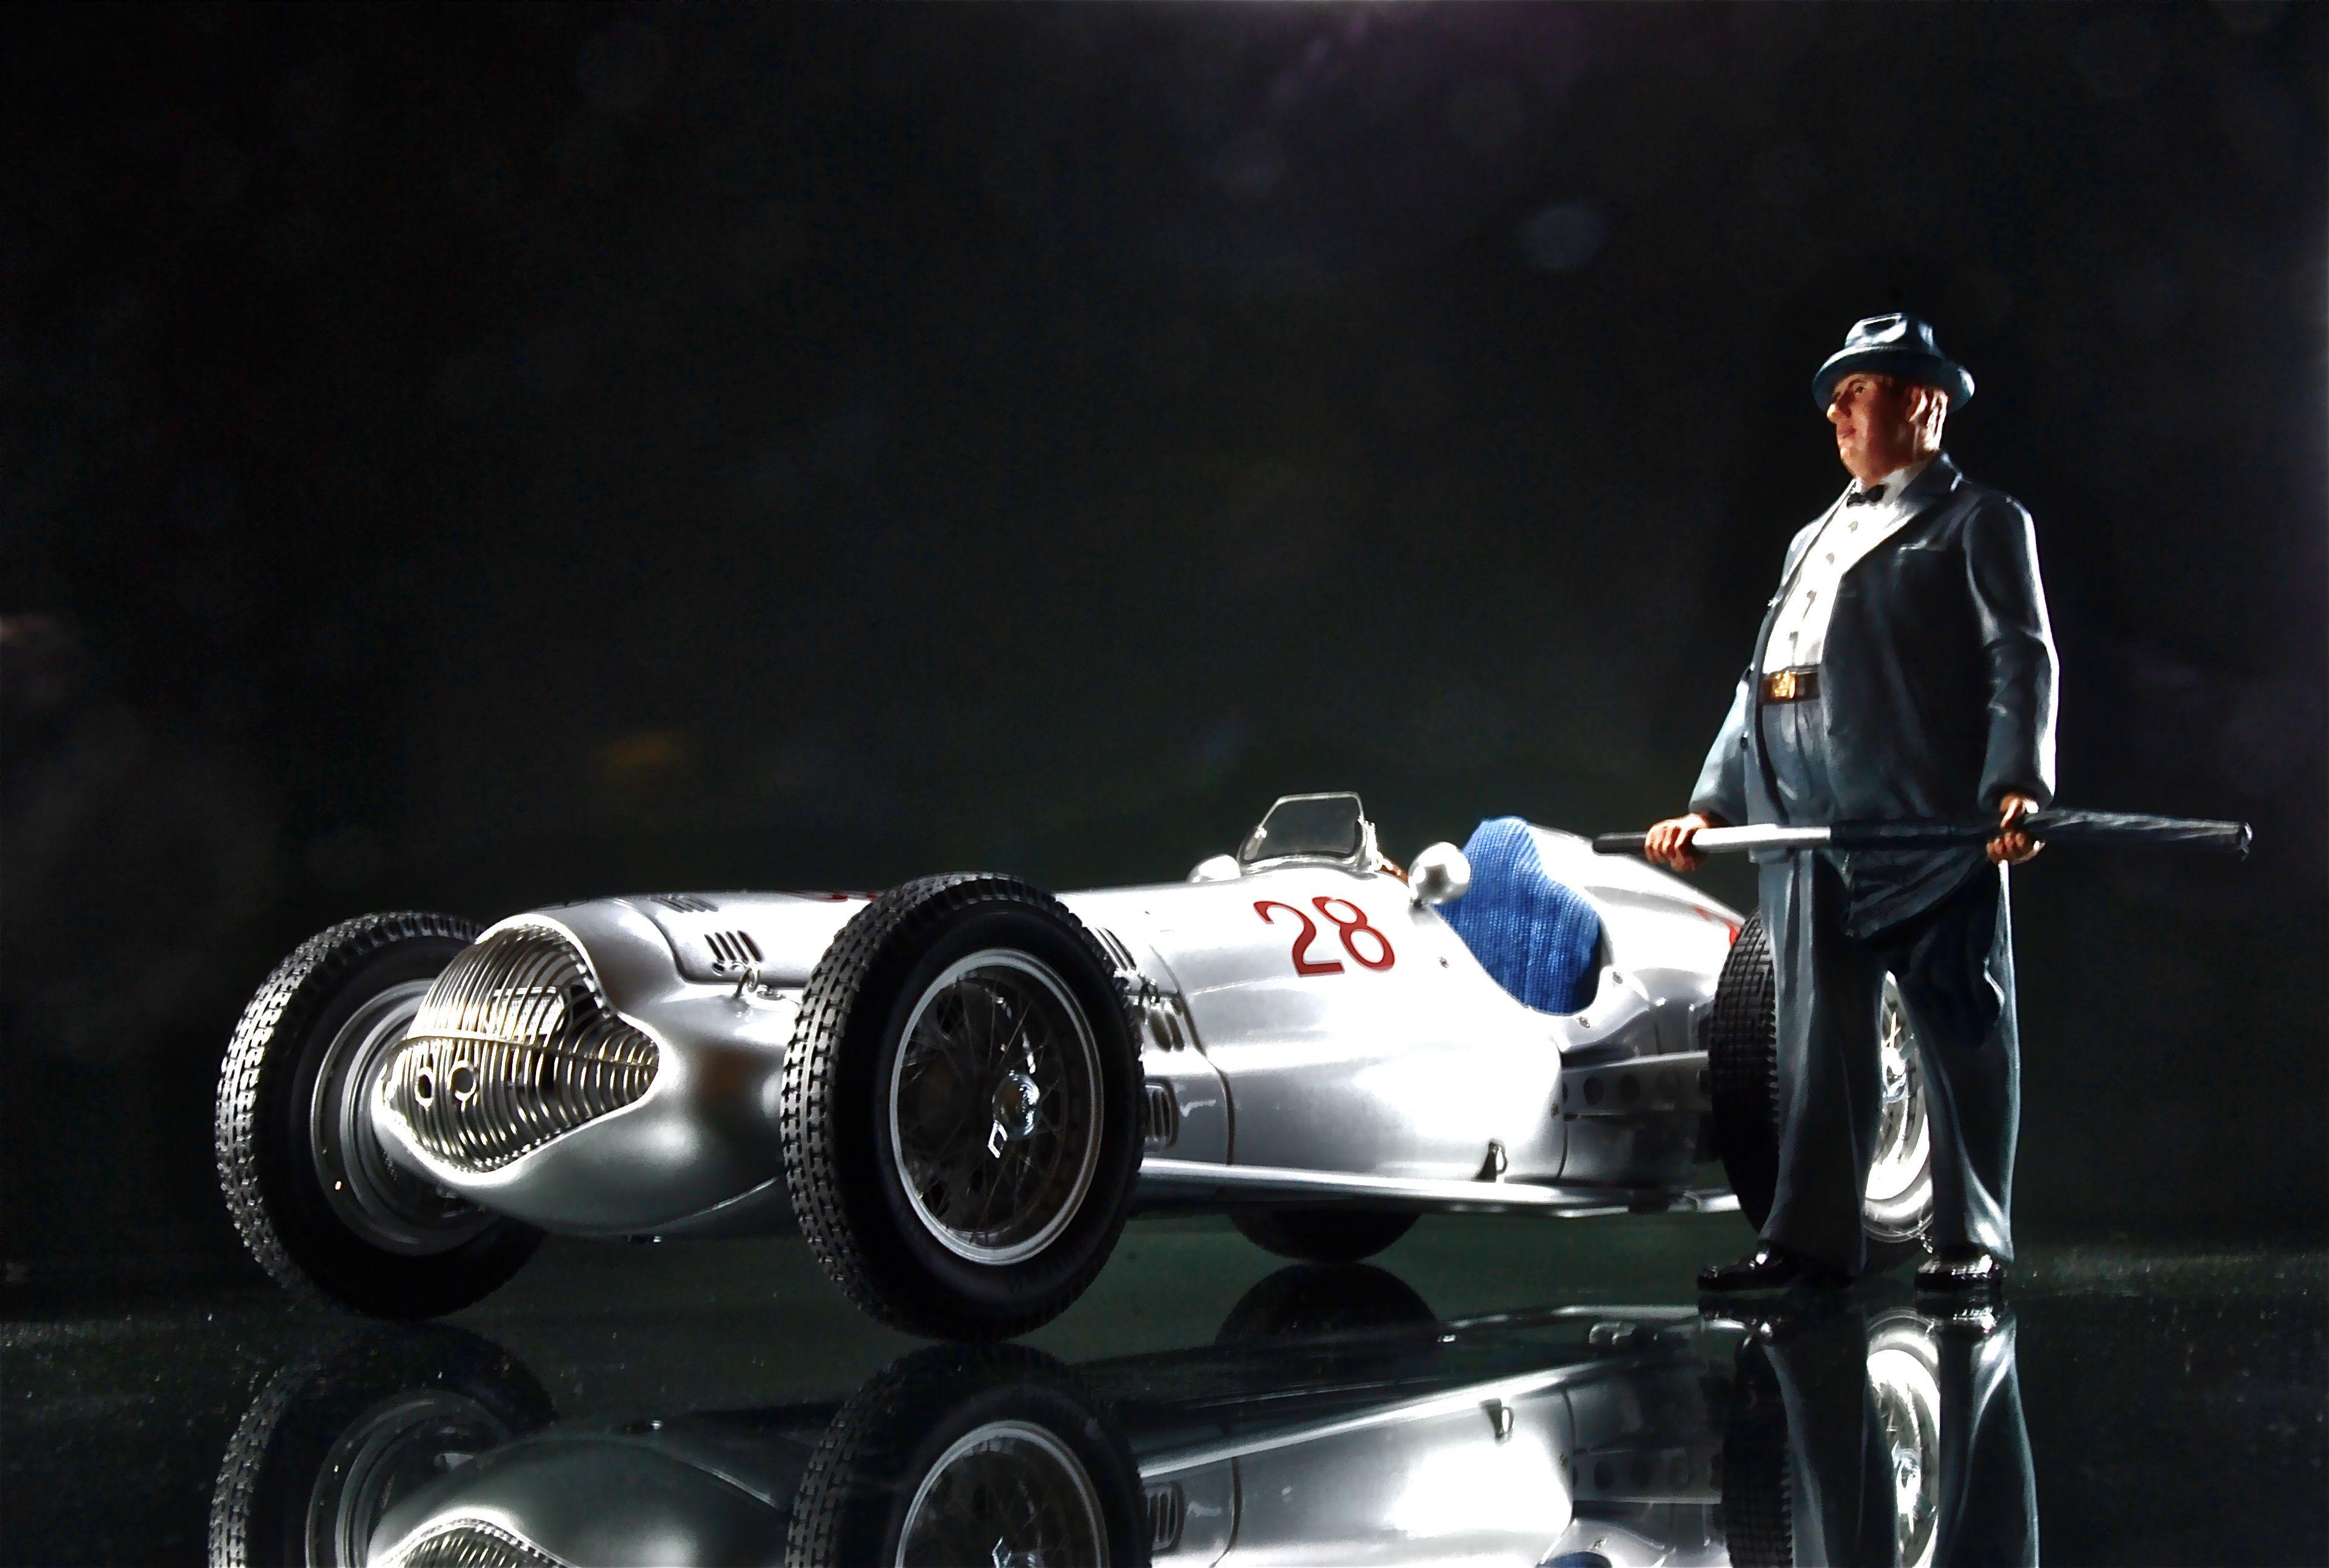 M040 Mercedes Benz W154 28 Mercedes benz, Benz, Racing